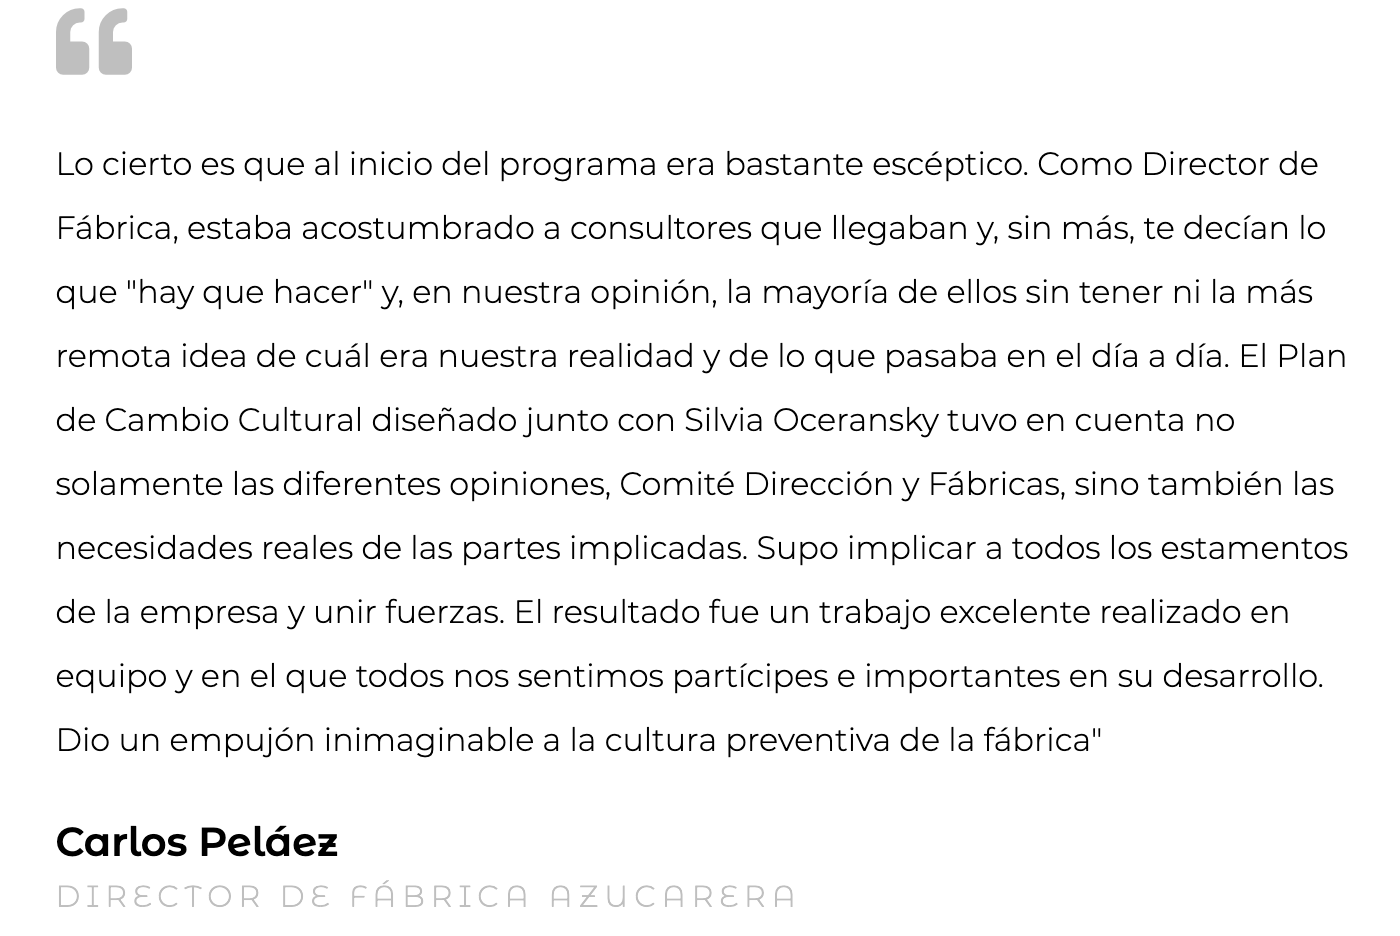 Silvia Oceransky Cultura Preventiva opiniones Cultura Organizacional Carlos Pelaez